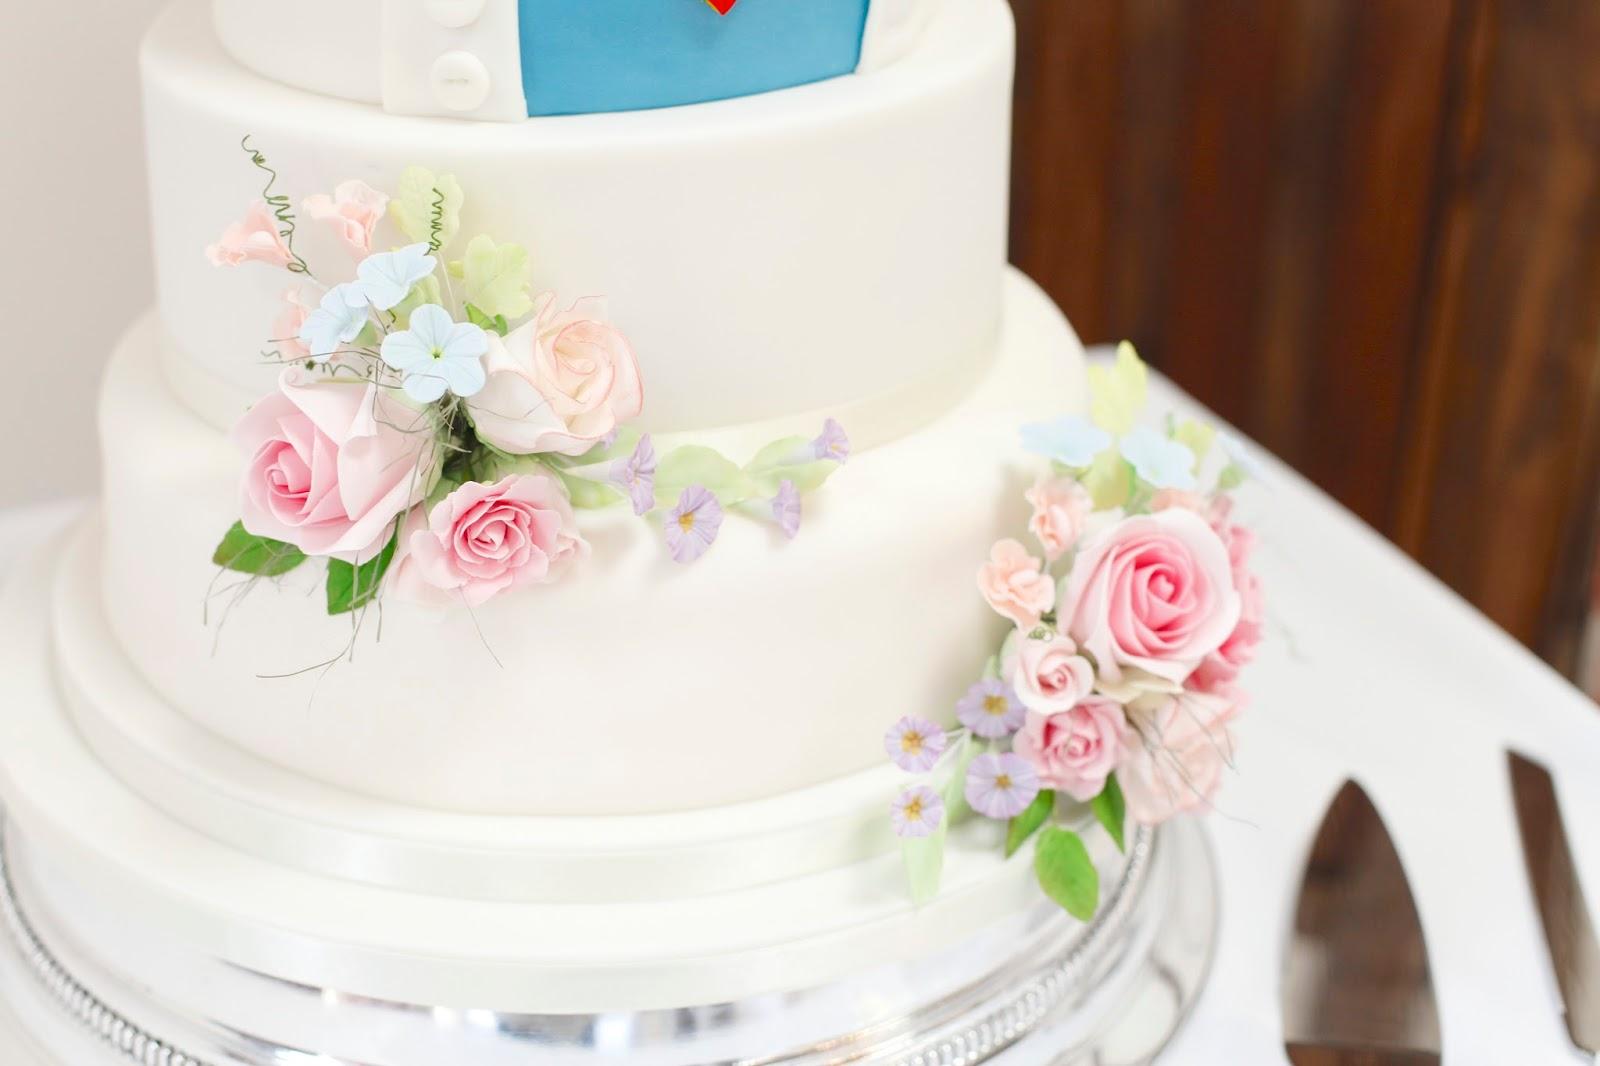 Kasserina: Pastels and superheroes wedding cake - August 2015